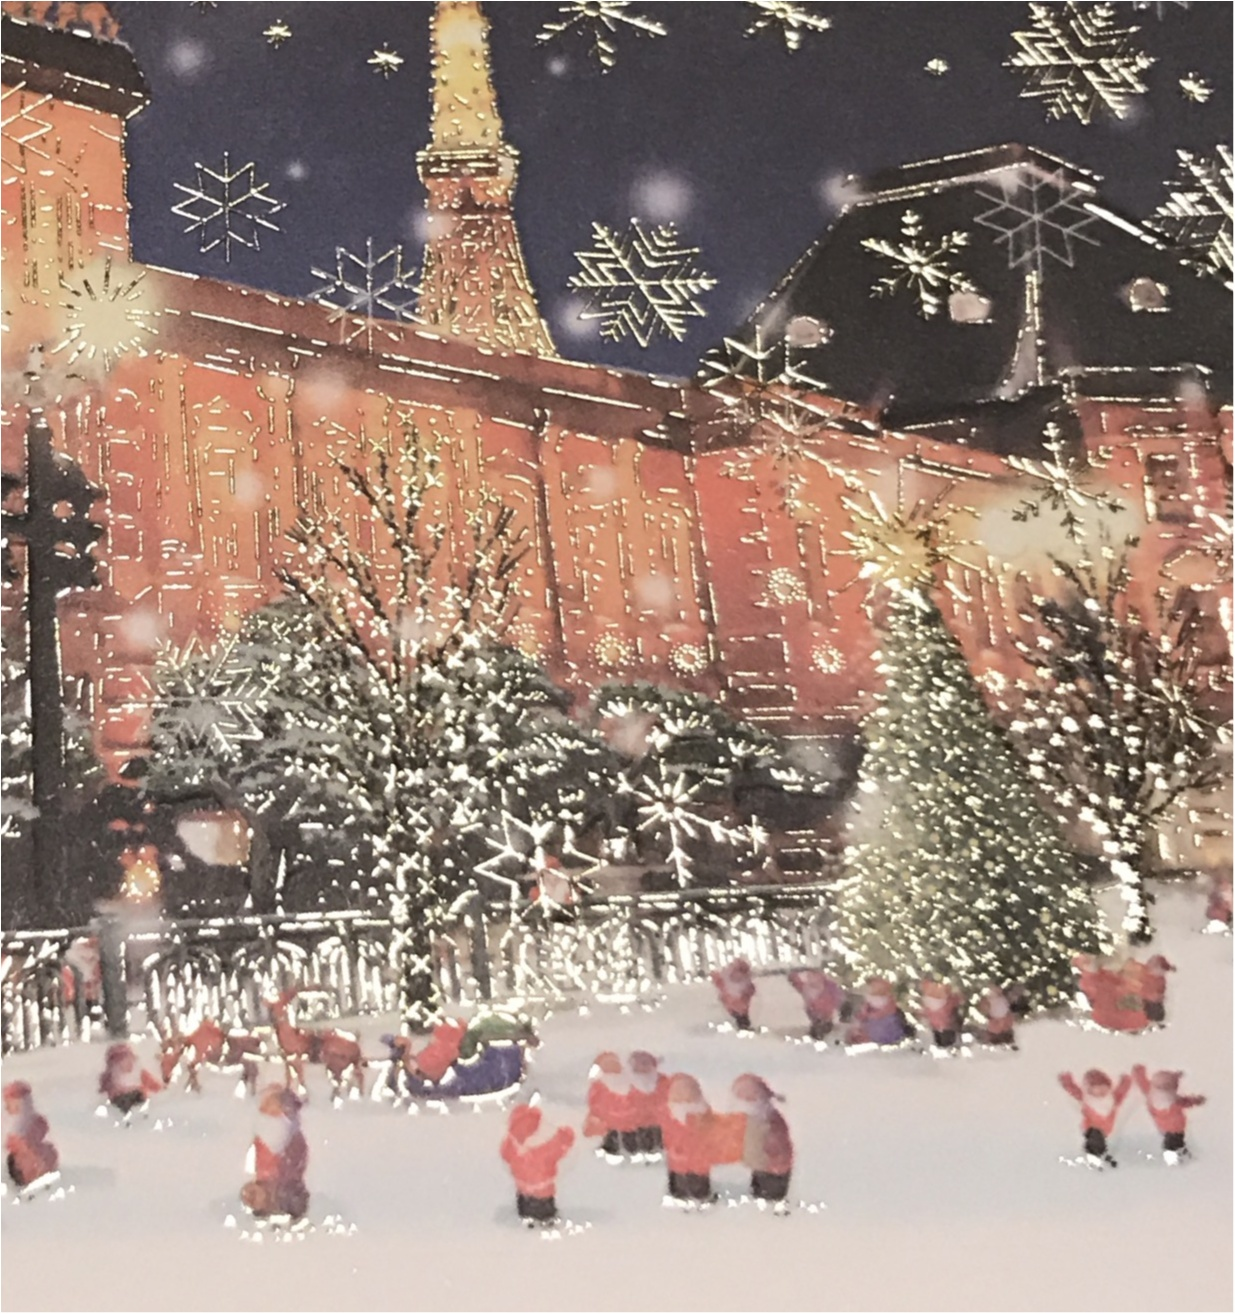 《Xmasプレゼントに添えて♡》 日本を旅するサンタさんが可愛いクリスマスカード❤︎_3